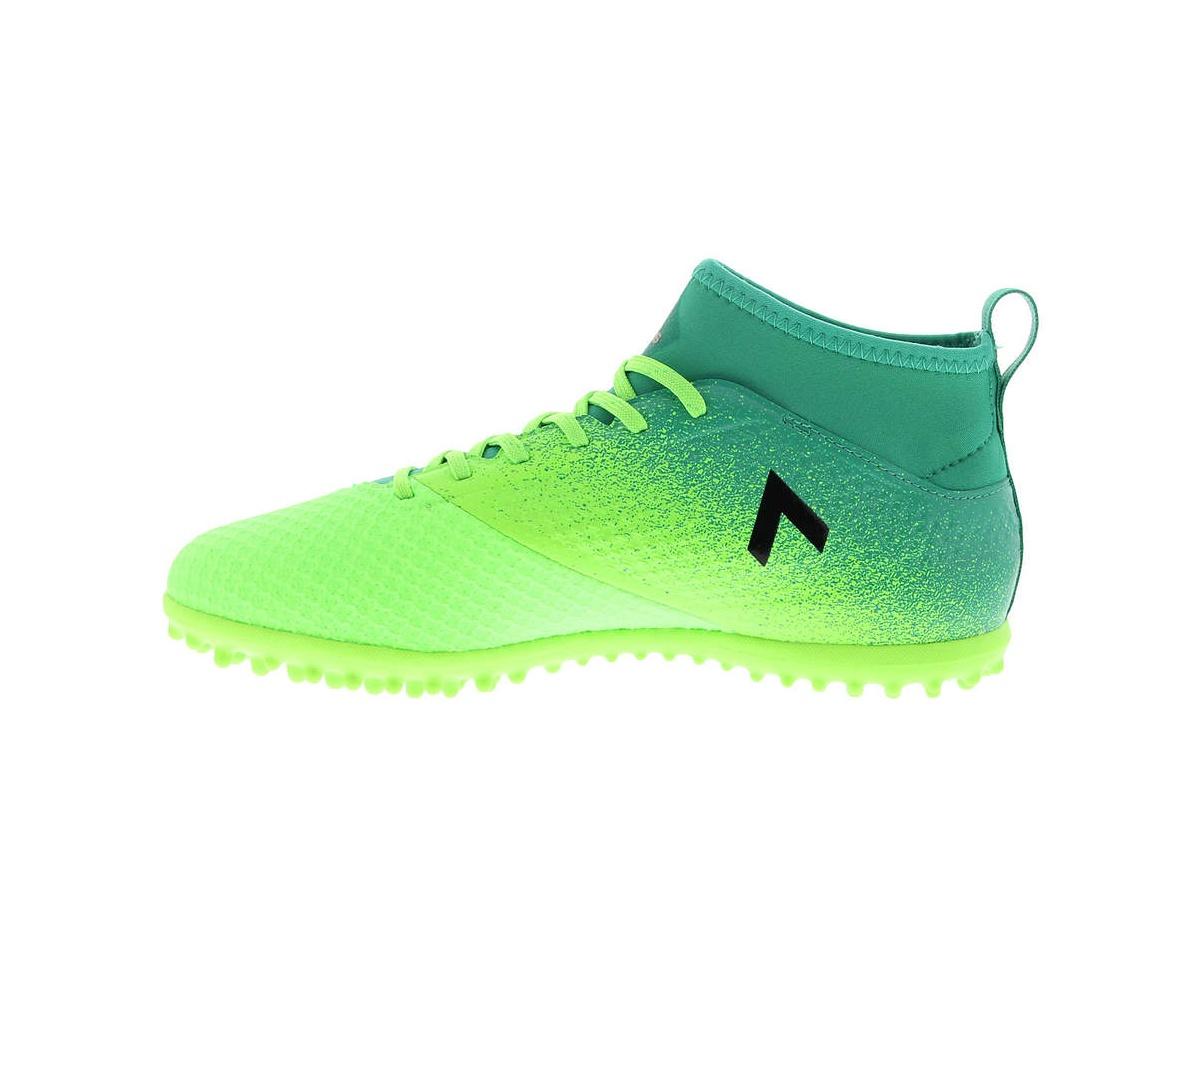 Chuteira Adidas Ace 17.3 Primemesh TF - Mundo do Futebol 32f1284c3717f